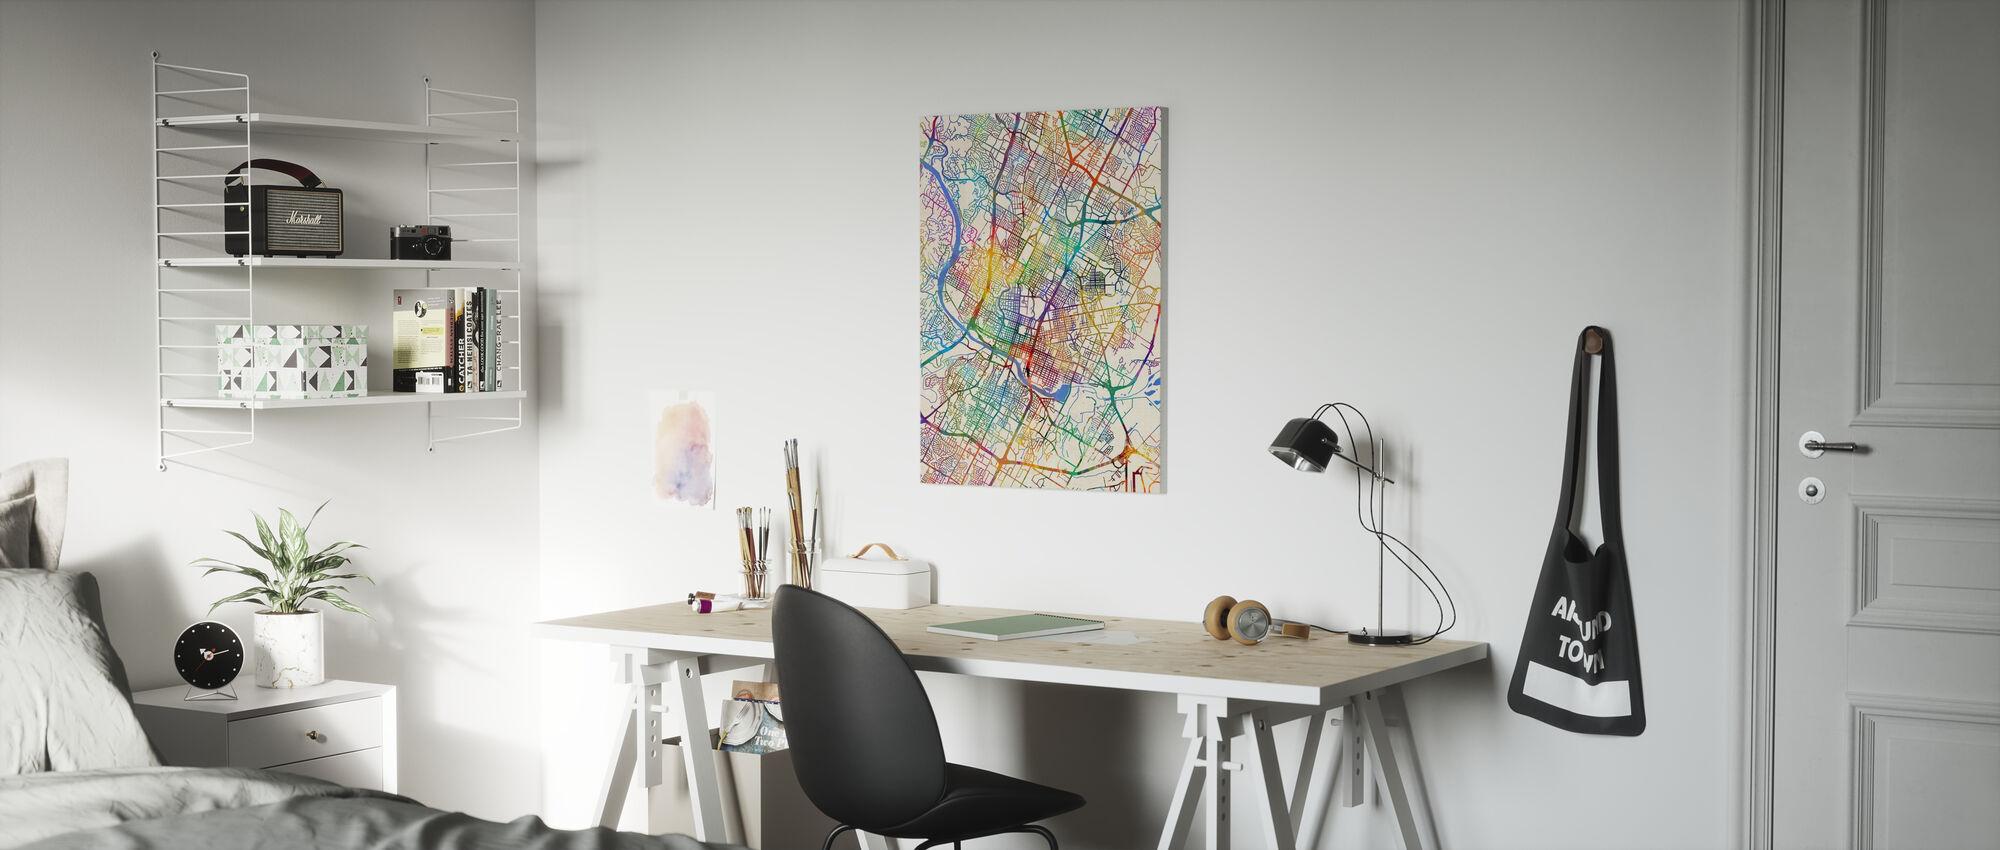 Austin Texas City Map - Canvas print - Kids Room